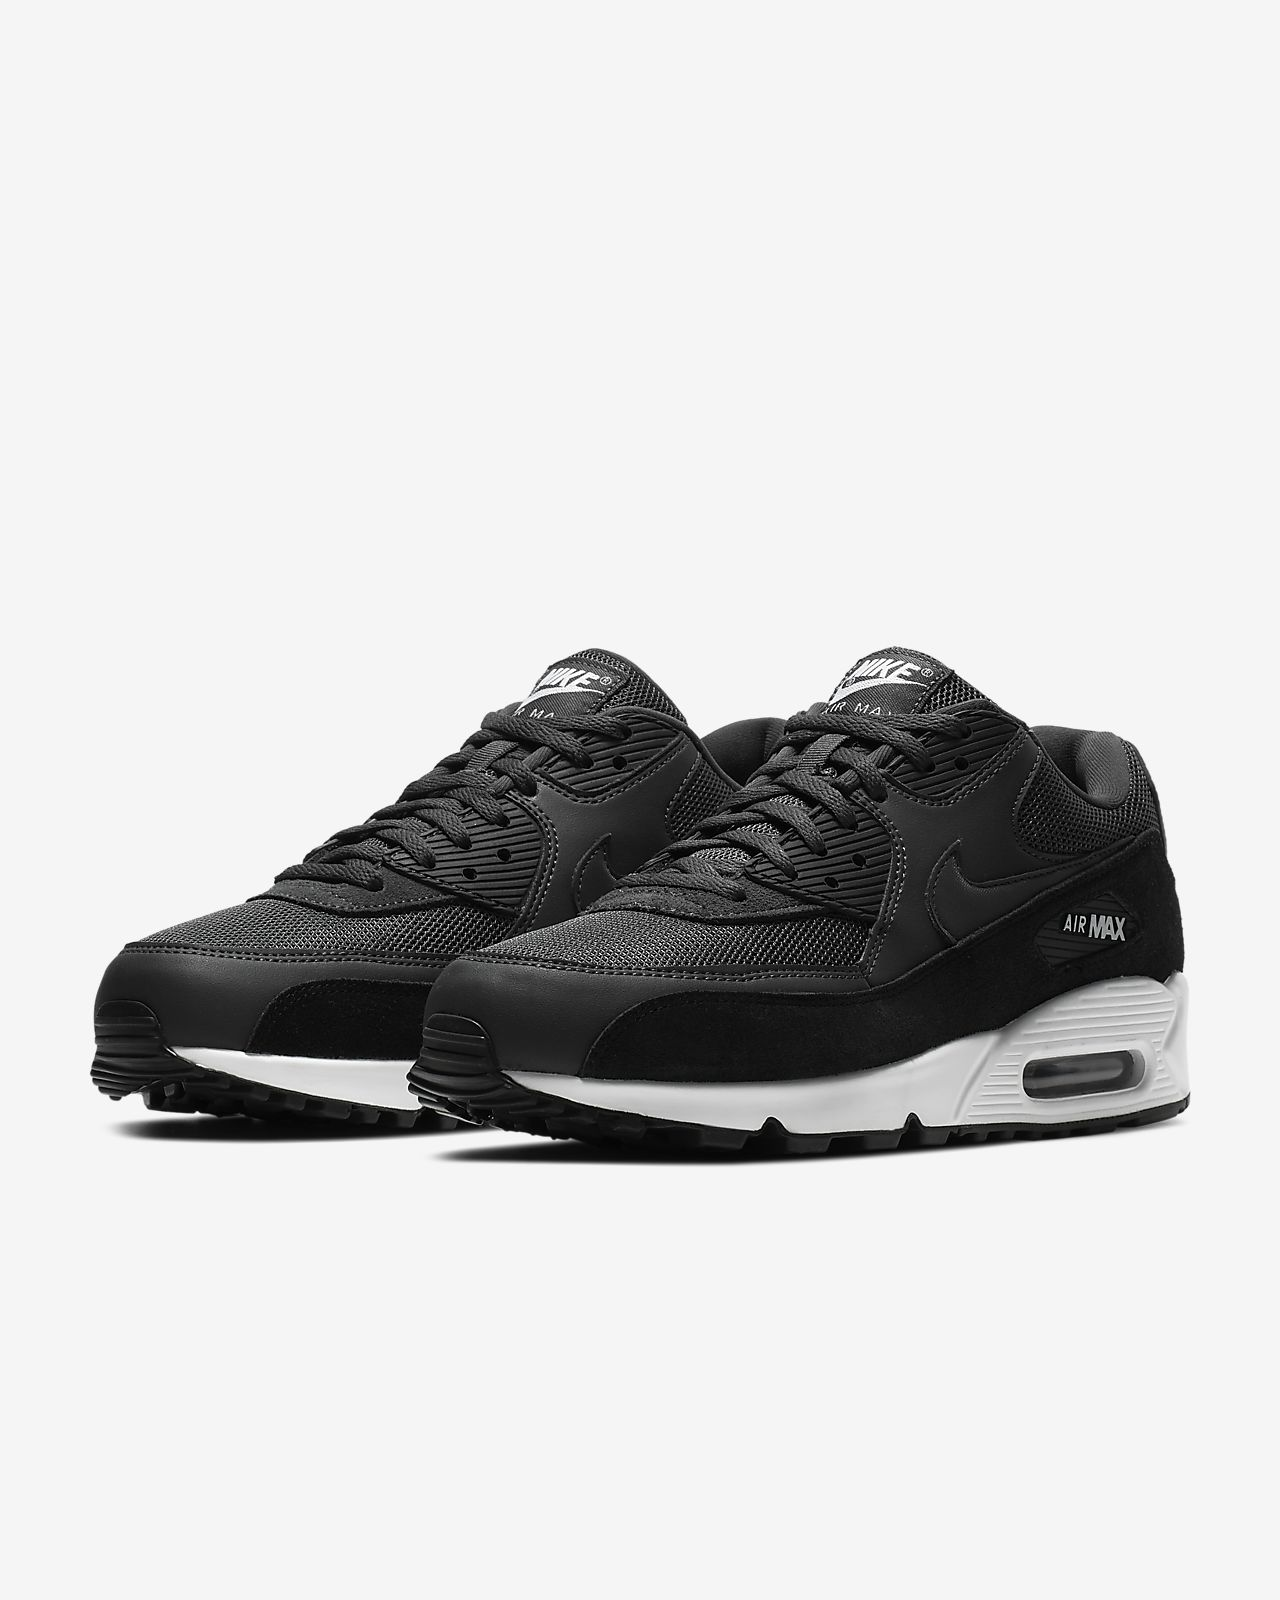 san francisco d1ee2 33110 ... Nike Air Max 90 Essential Herrenschuh